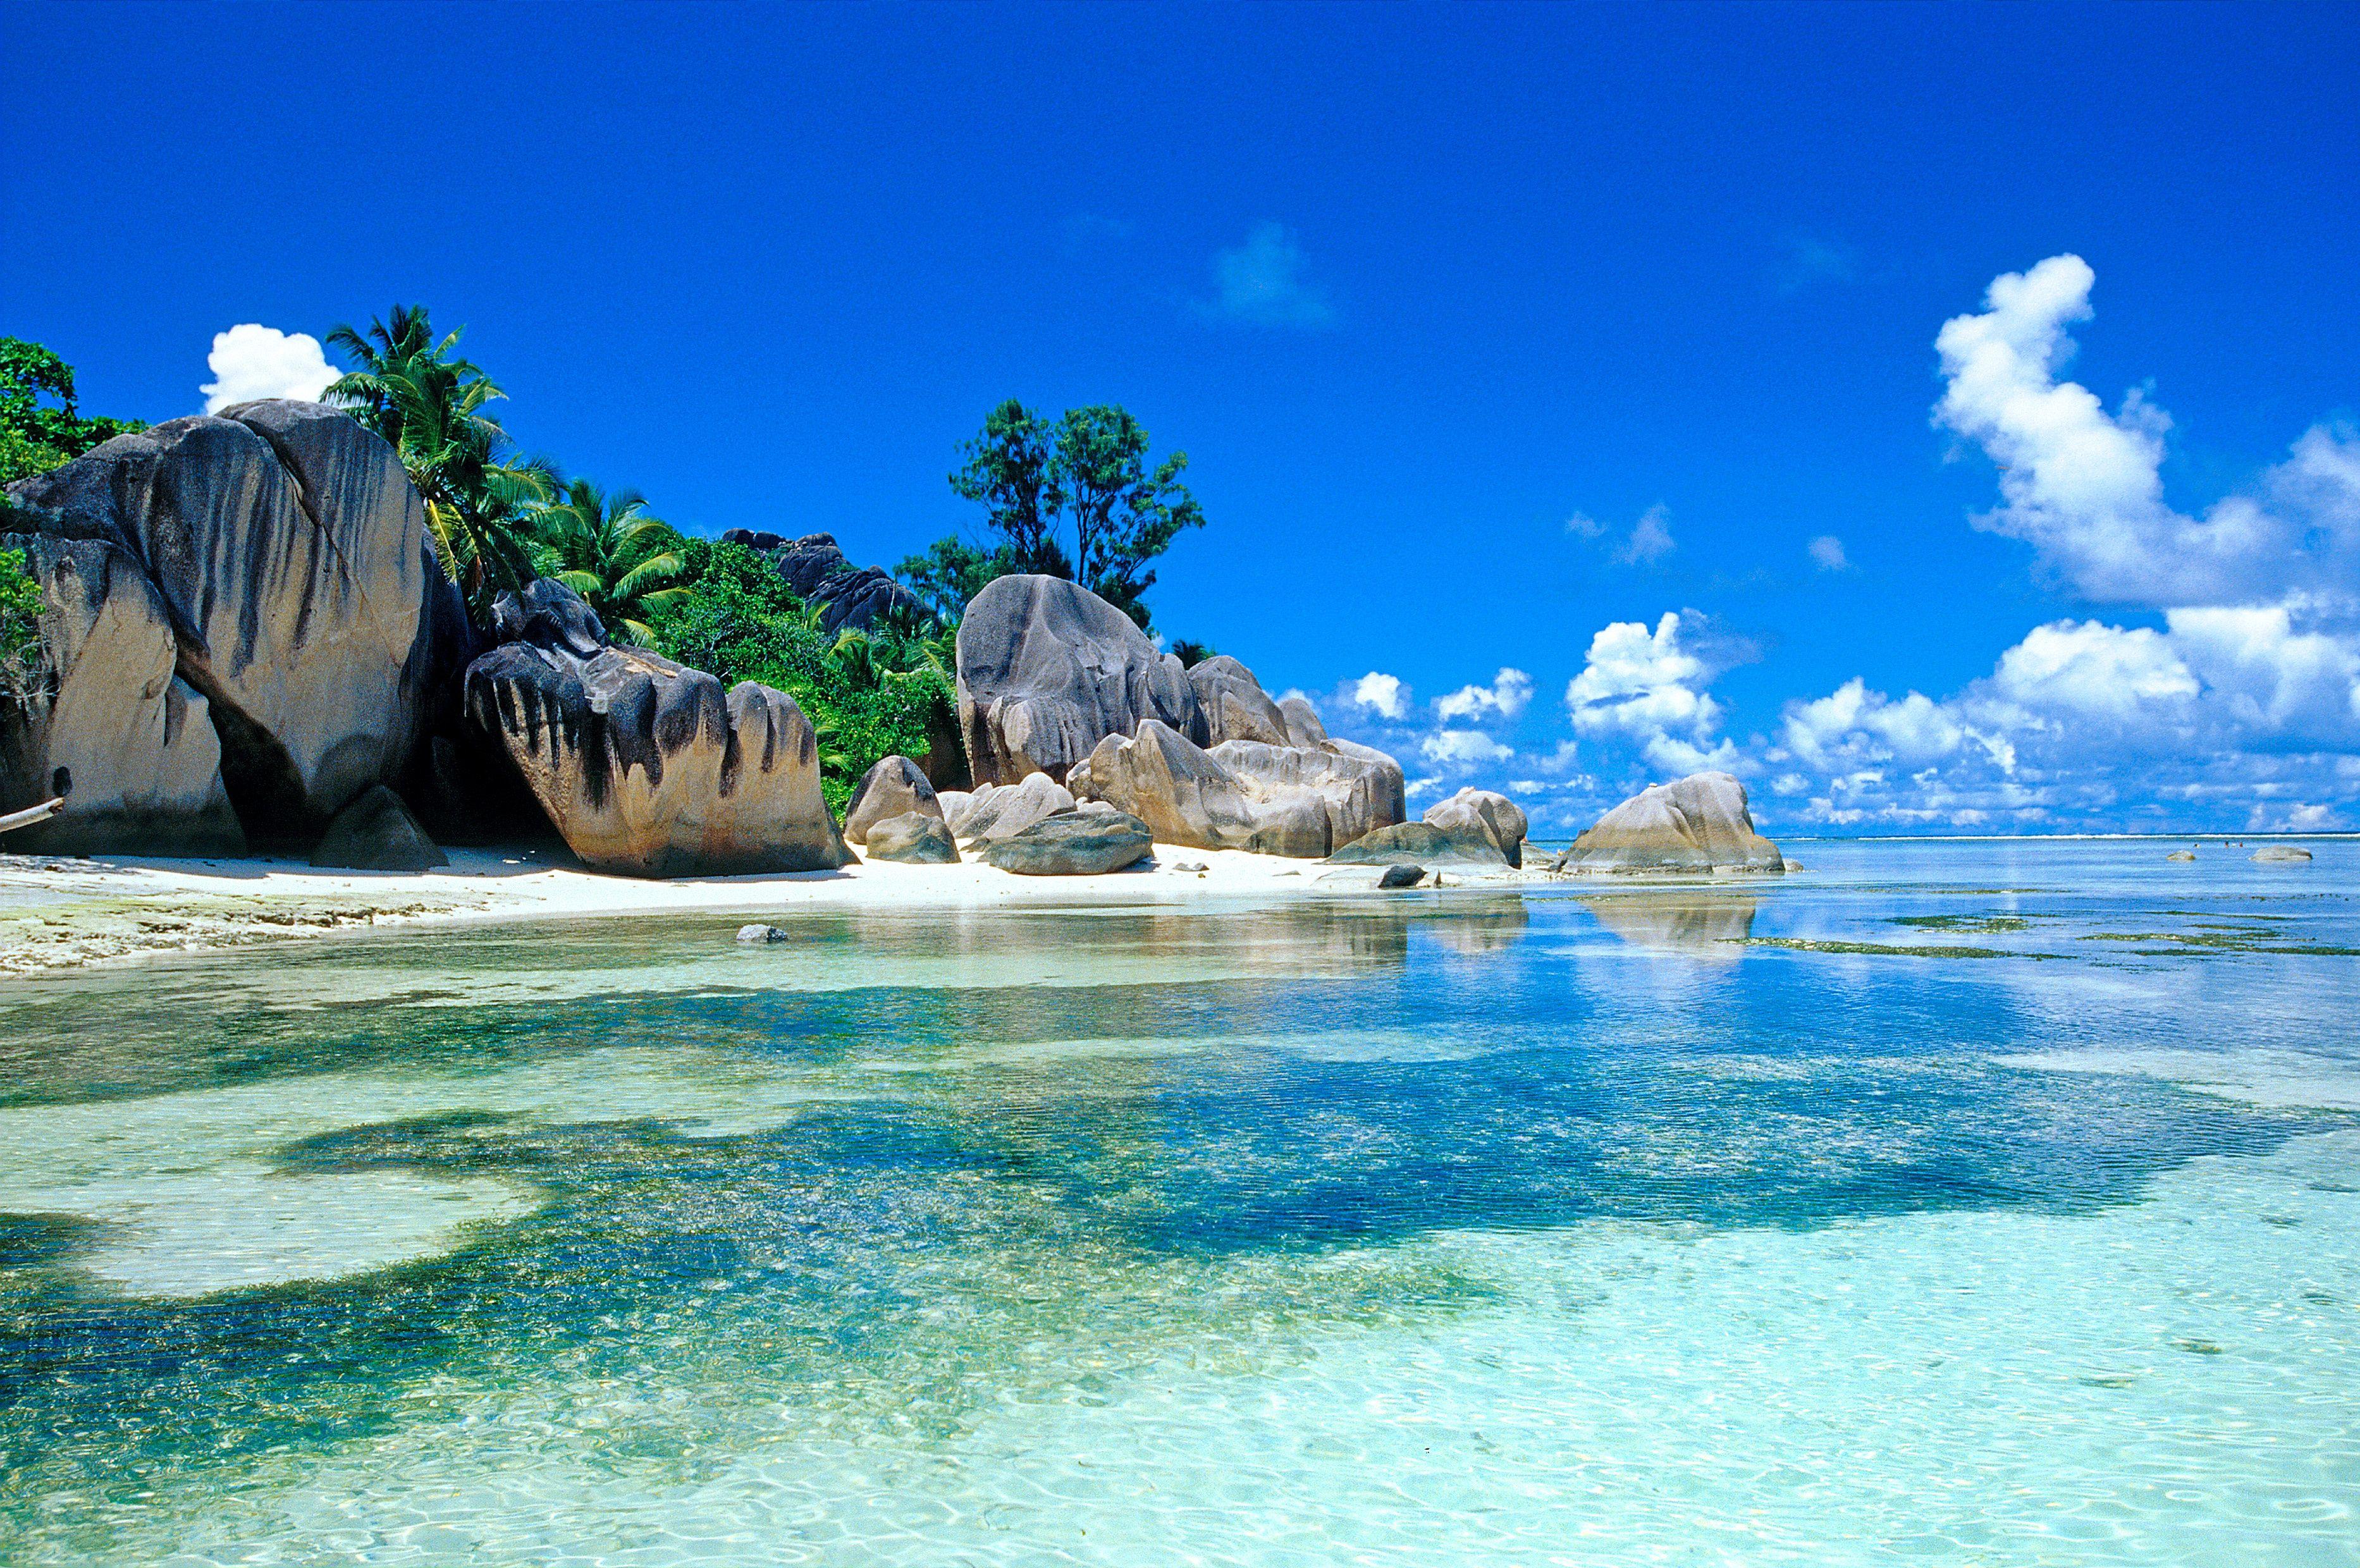 Seychelles Islands Indian Ocean Beaches In The World